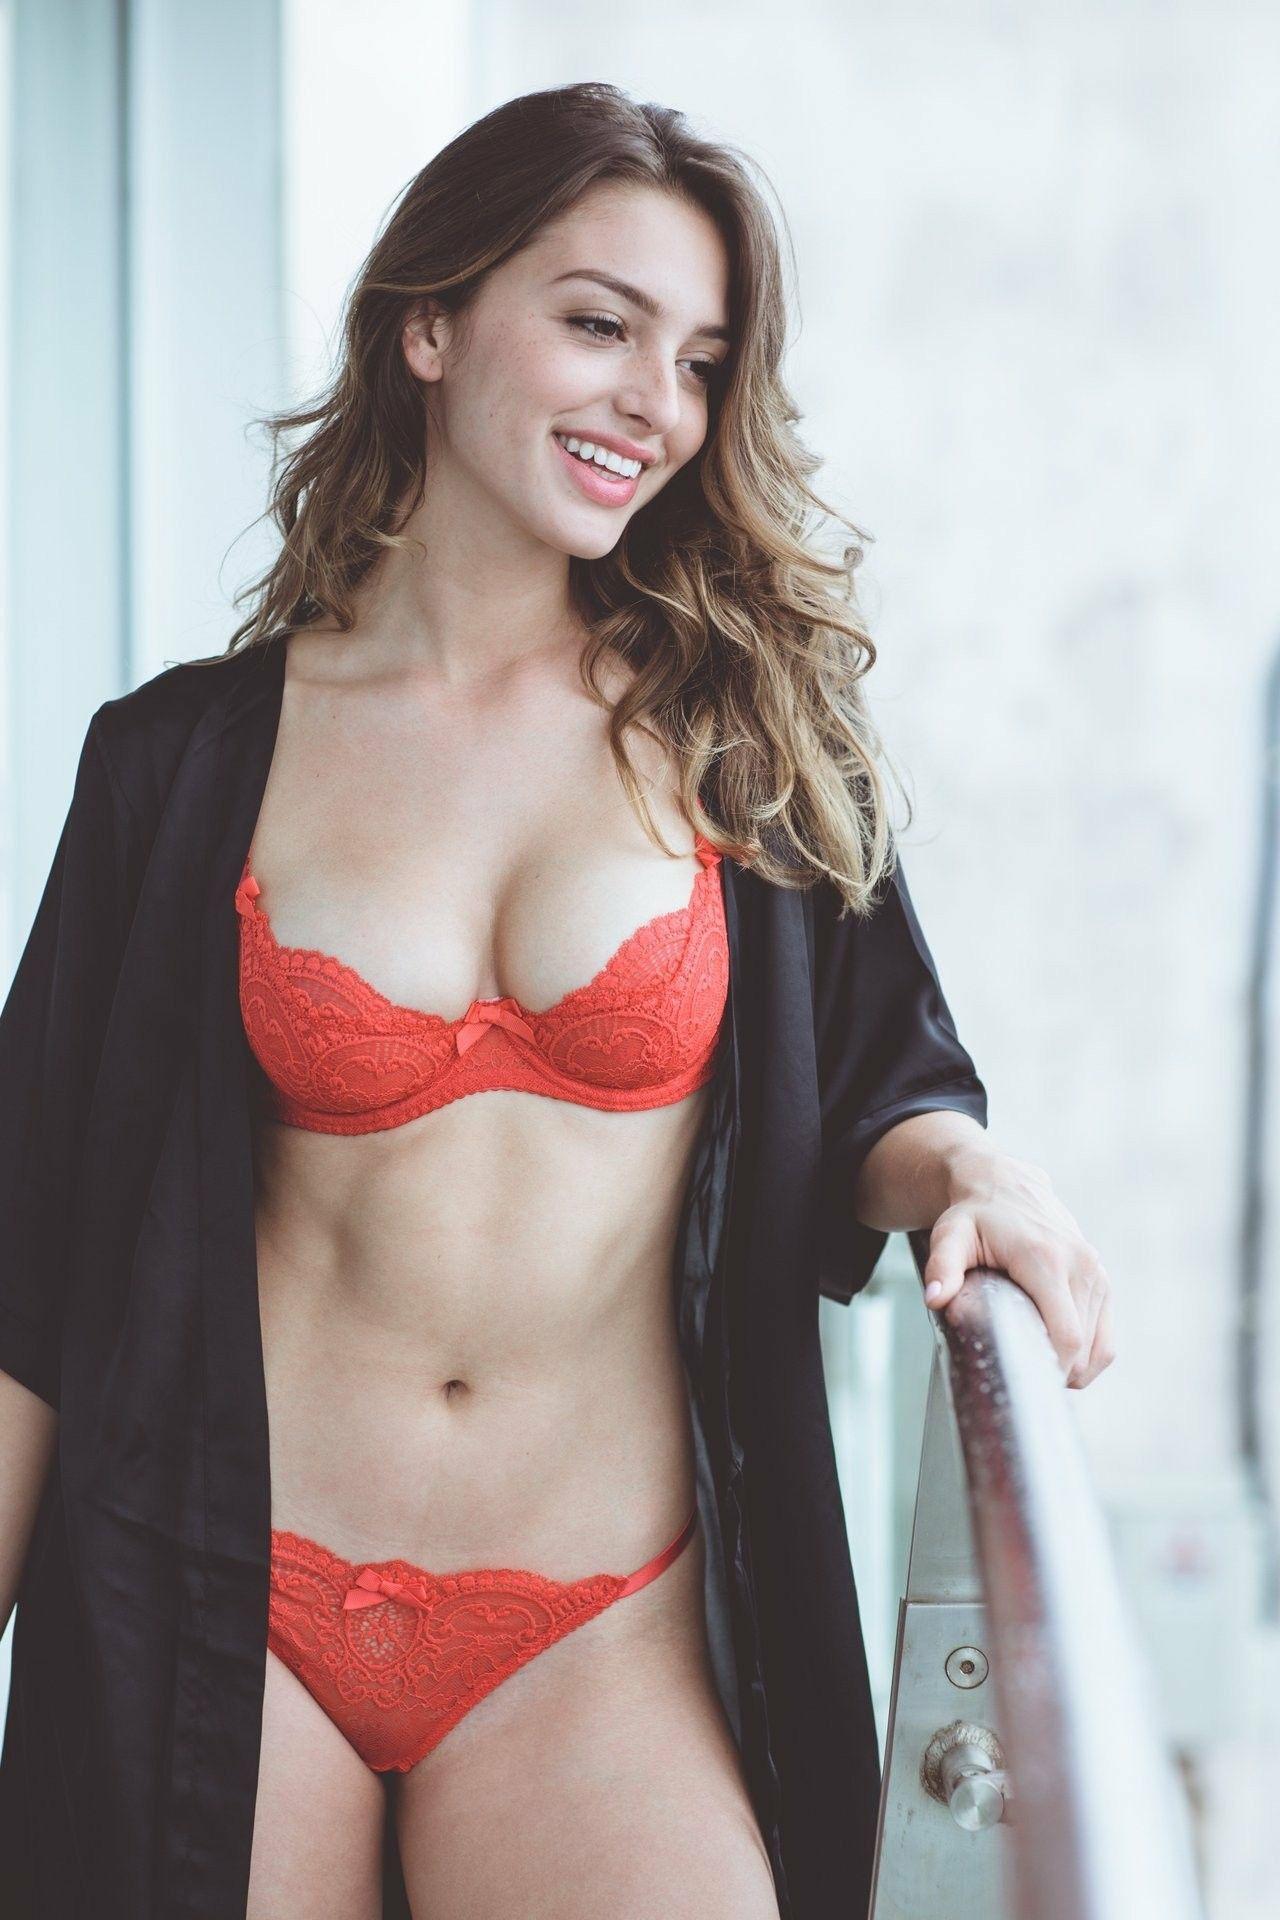 Celine Farach-hot-girl-dep-nhat-mang-xa-hoi-den-viet-nam.jpg4